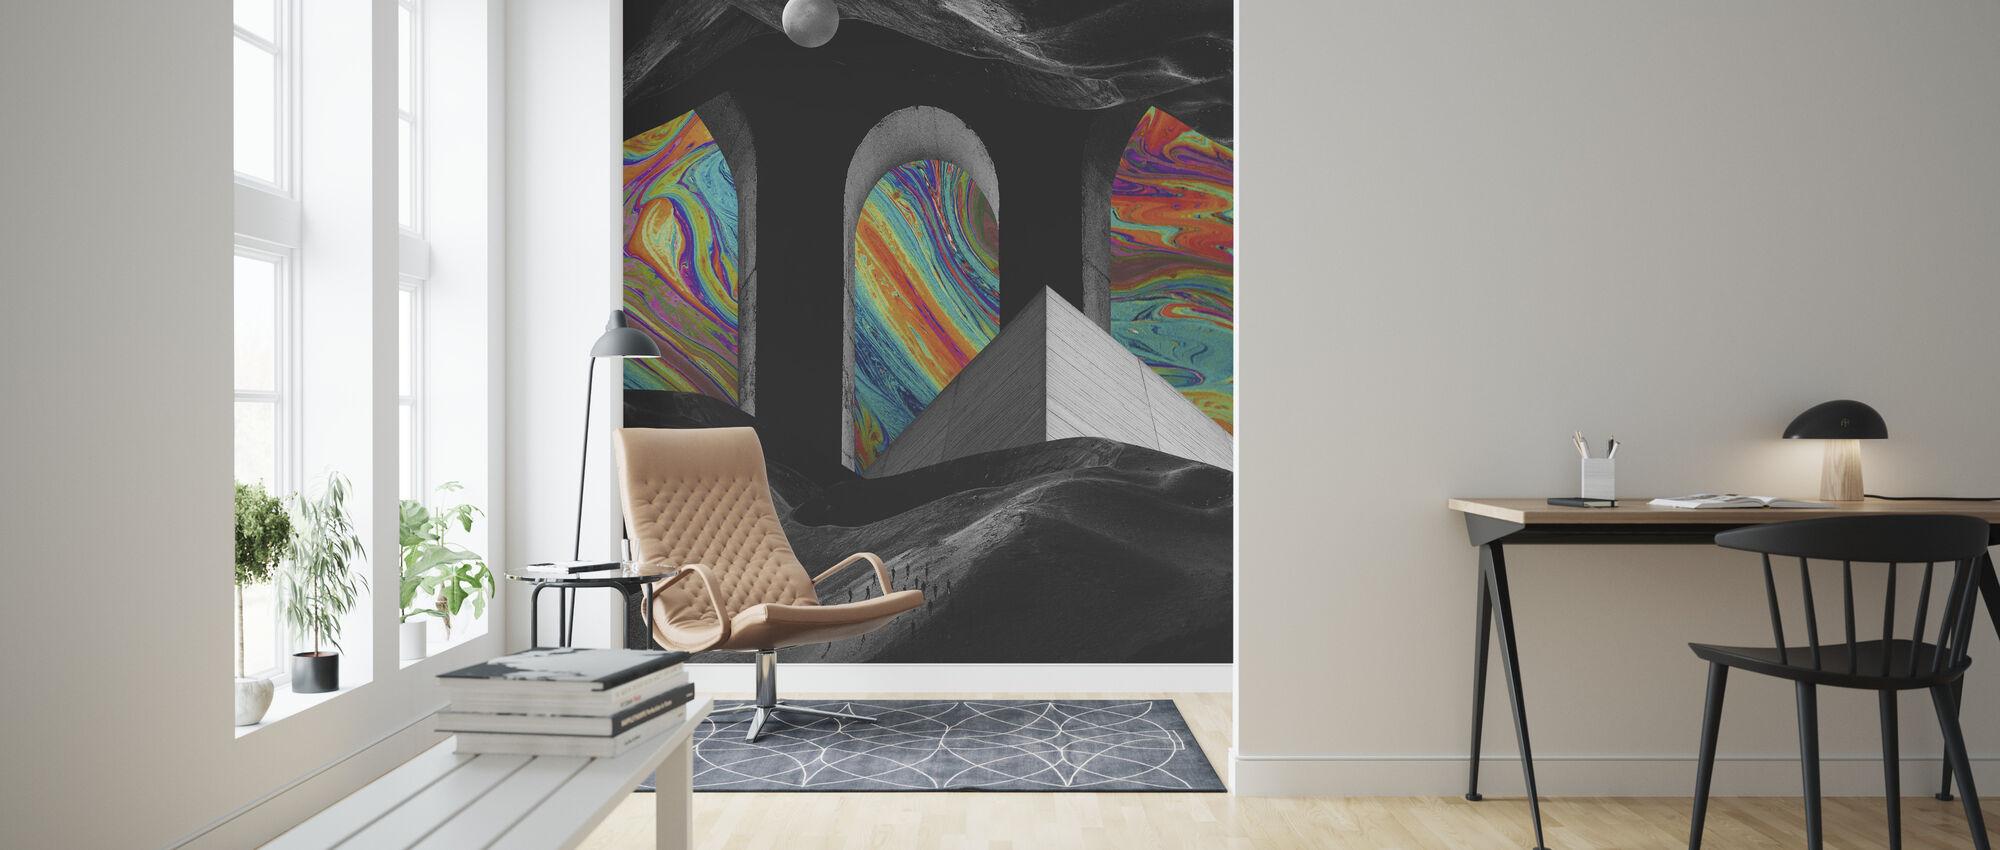 Hoc - Wallpaper - Living Room